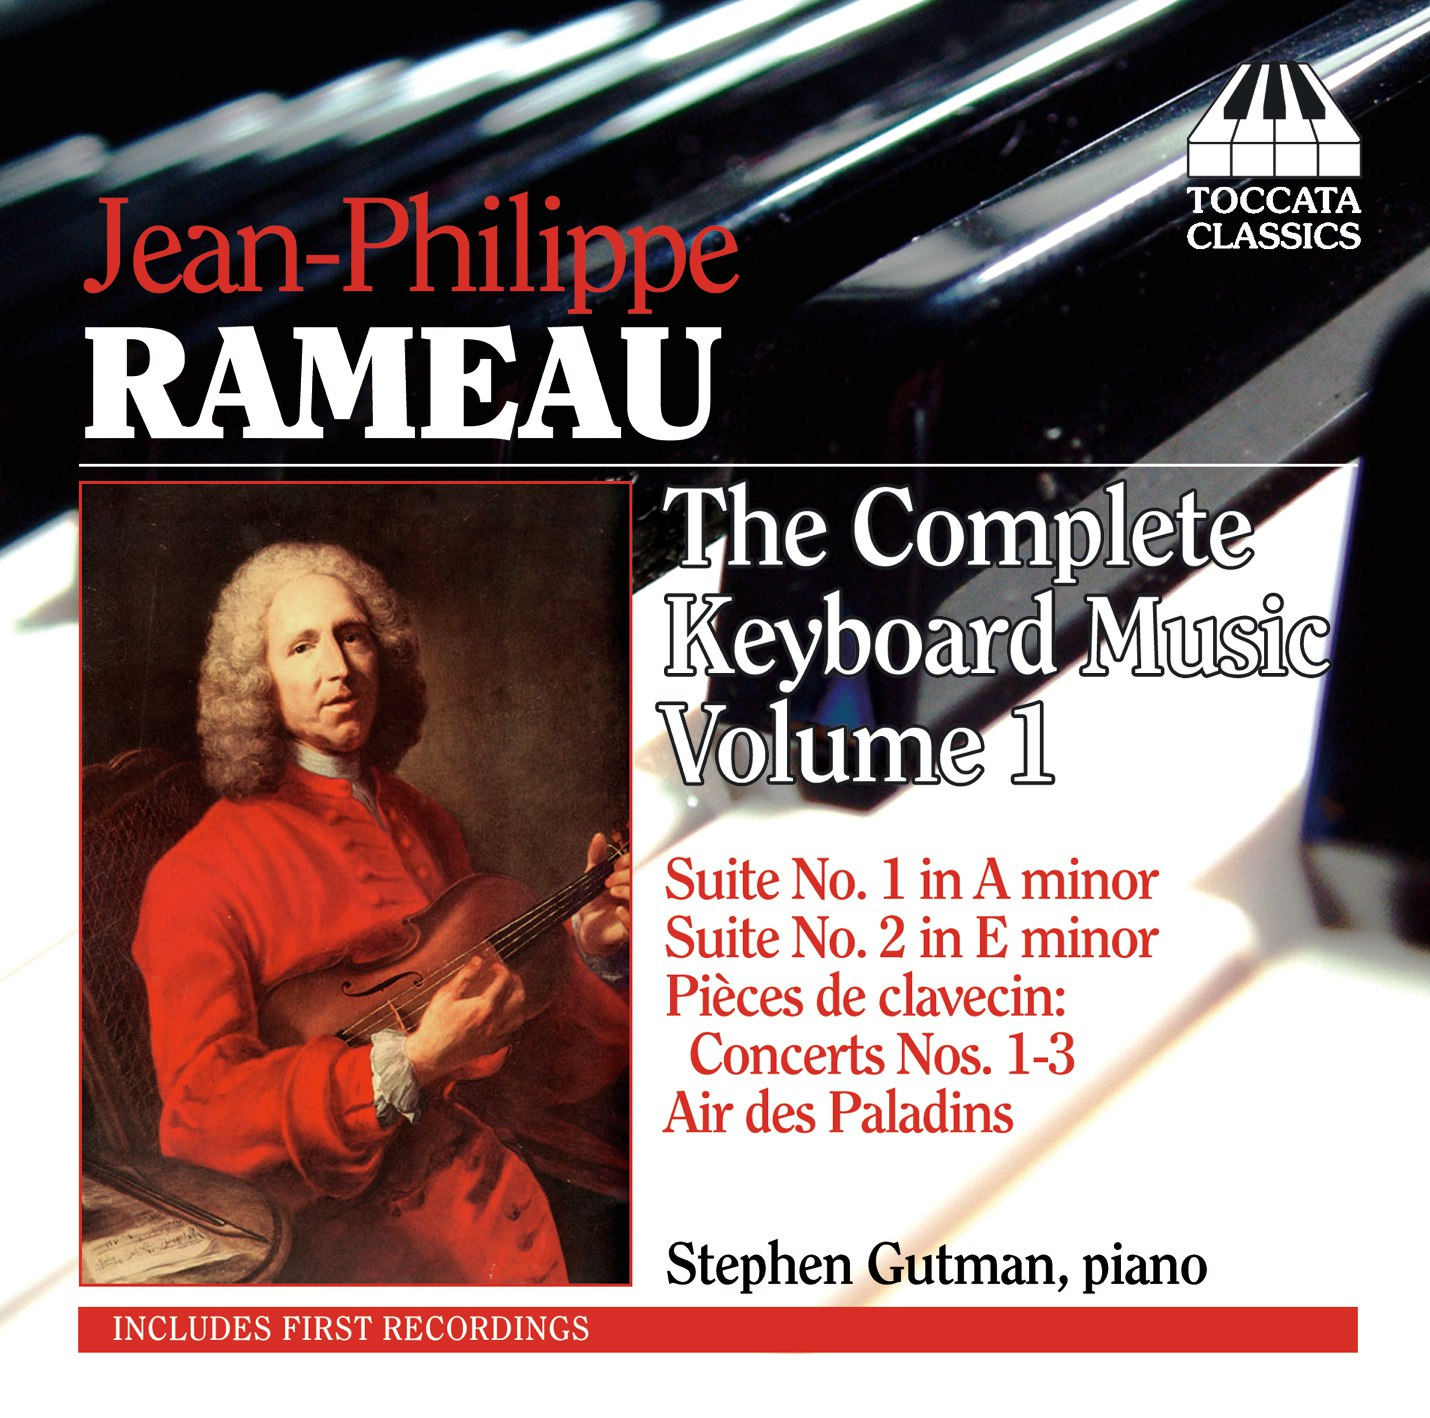 Jean-Philippe Rameau: The Complete Keyboard Music